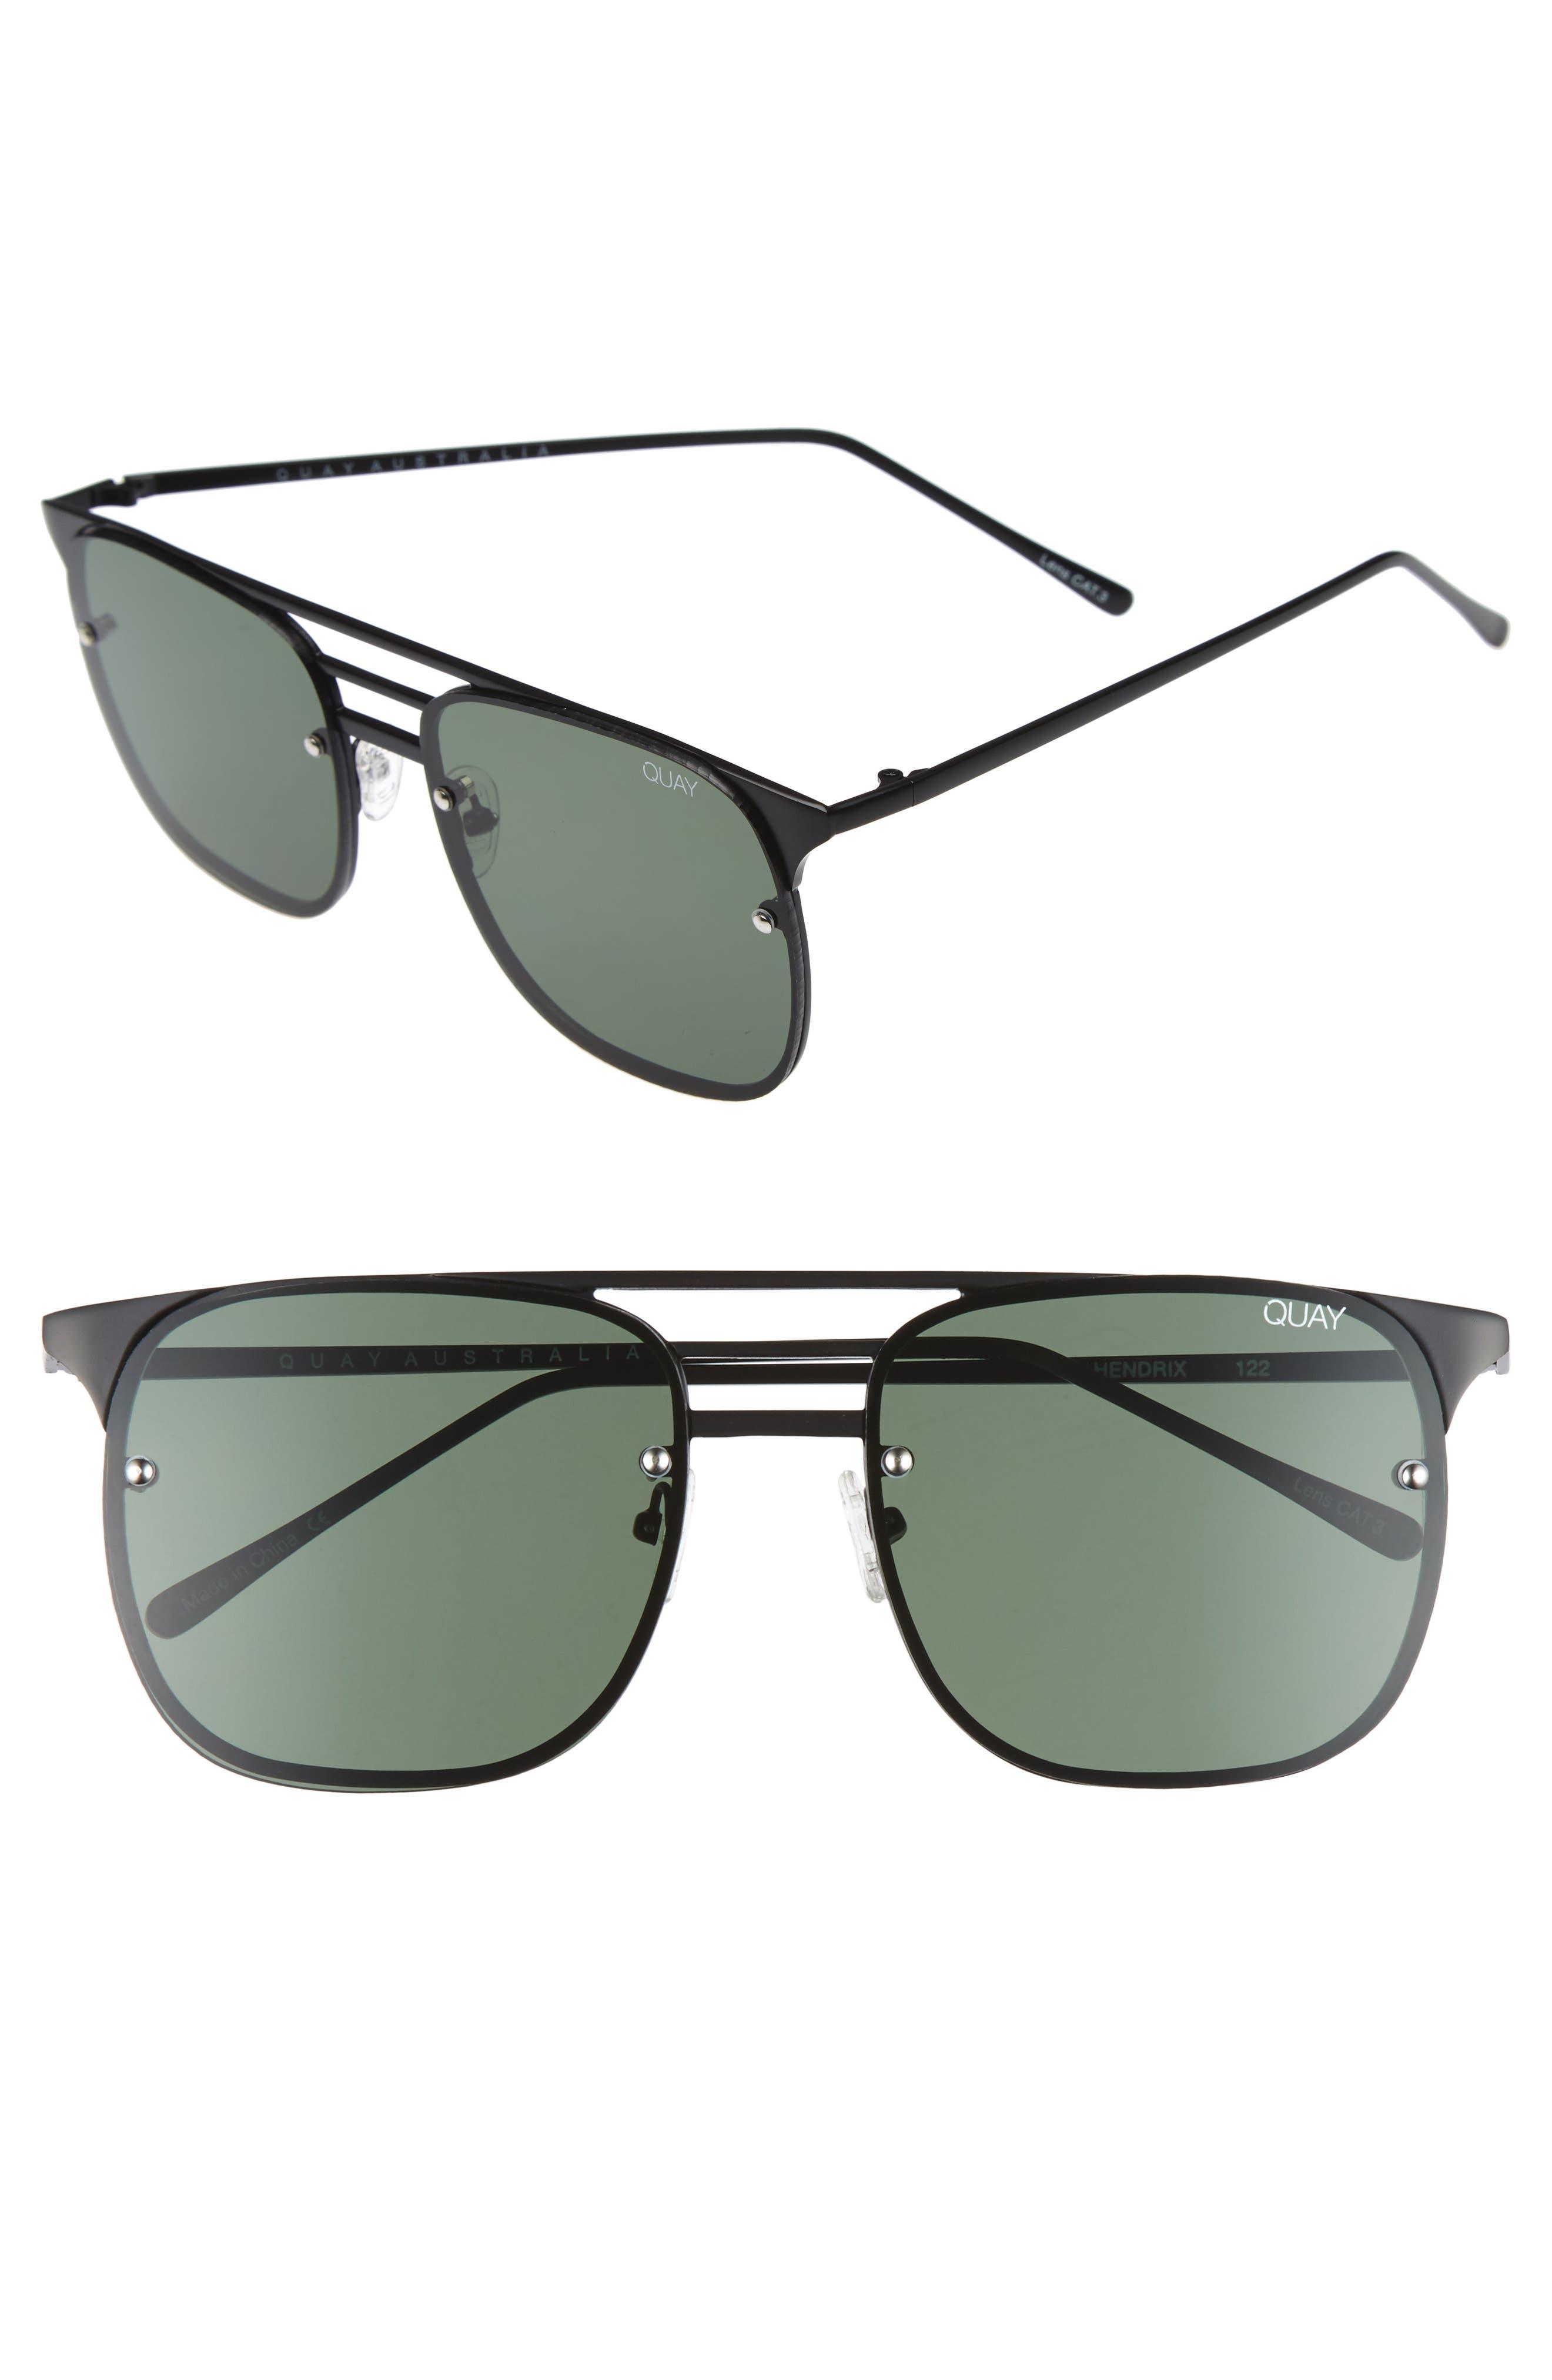 Hendrix 64mm Navigator Sunglasses,                         Main,                         color, Black/ Green